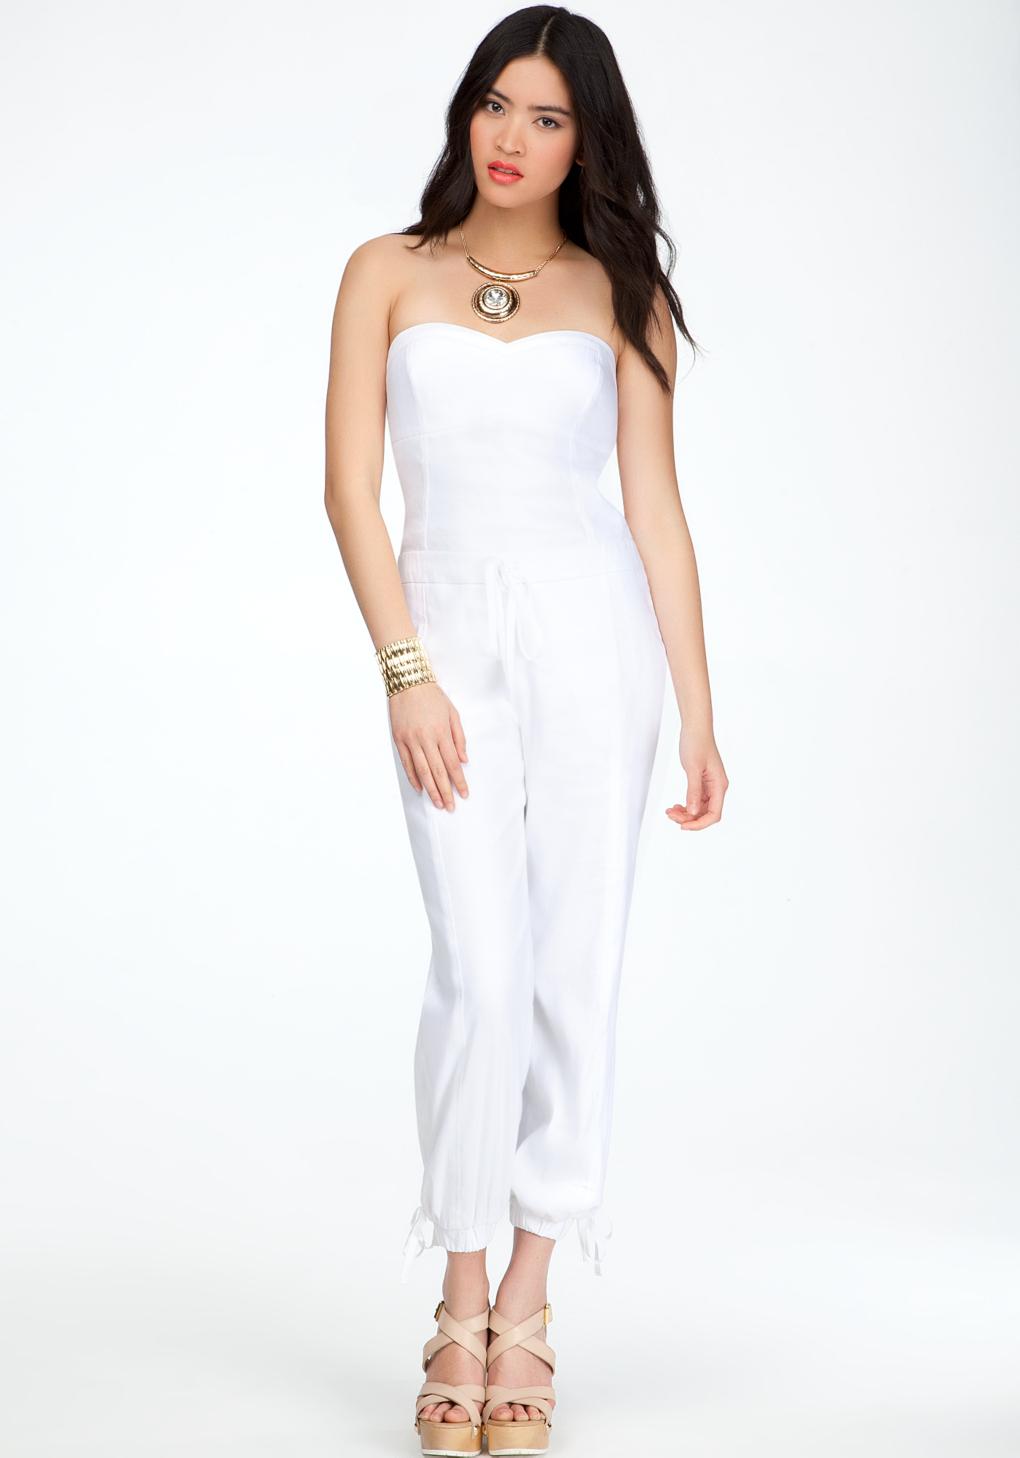 051d53e11 Bebe Sweetheart Neckline Jumpsuit in White - Lyst